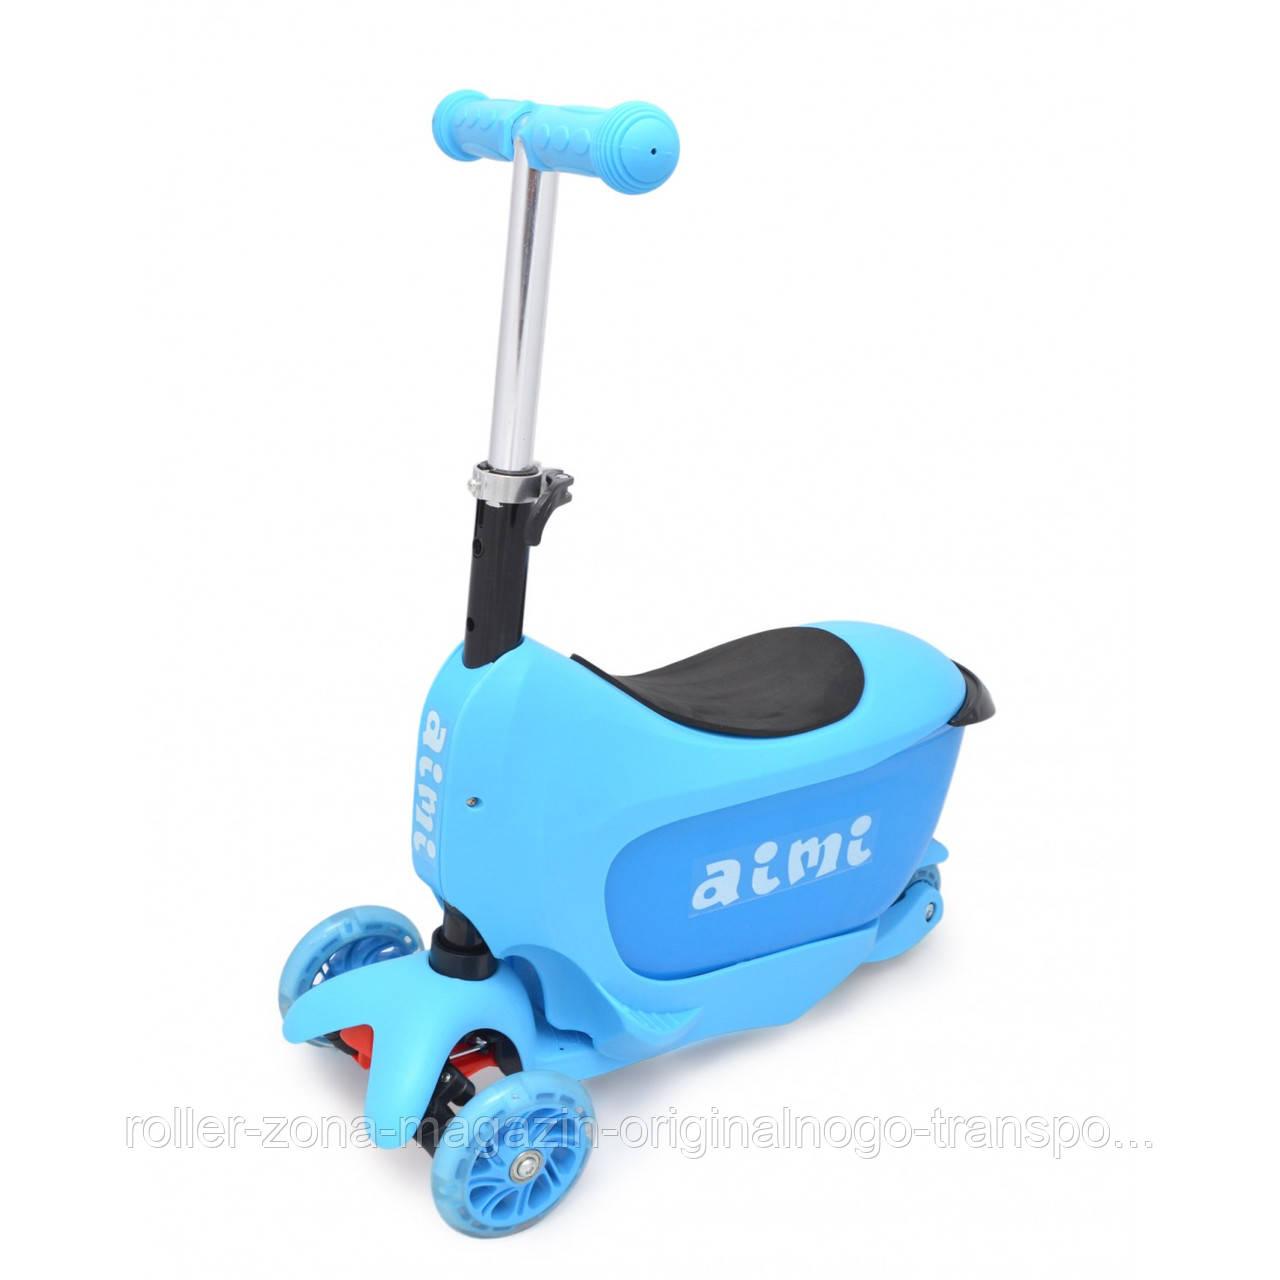 Самокат Maraton Scooter mini 2-go голубой